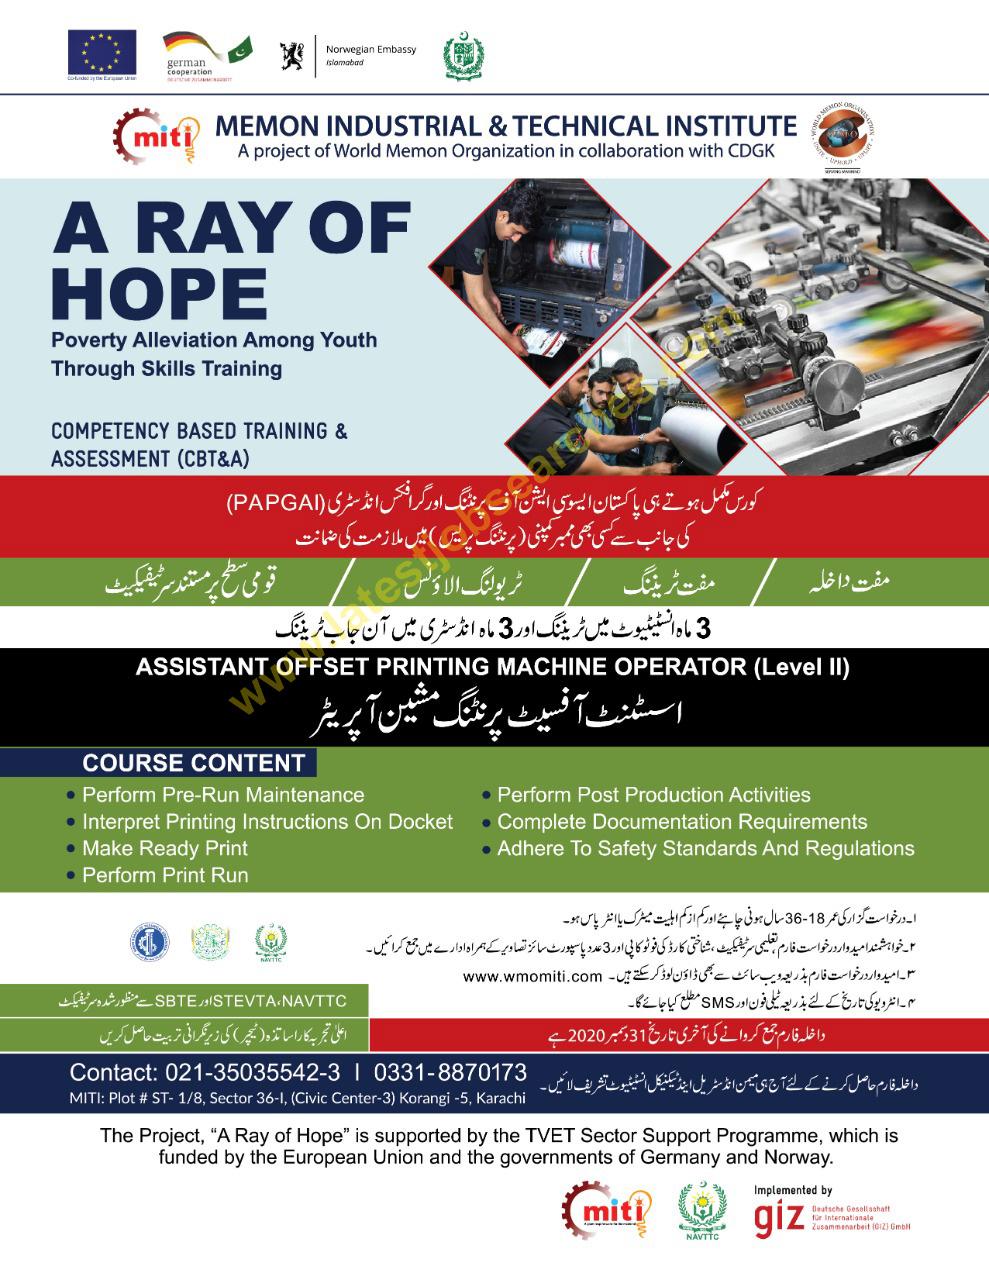 Memon industrial & Technical Institute skills and training